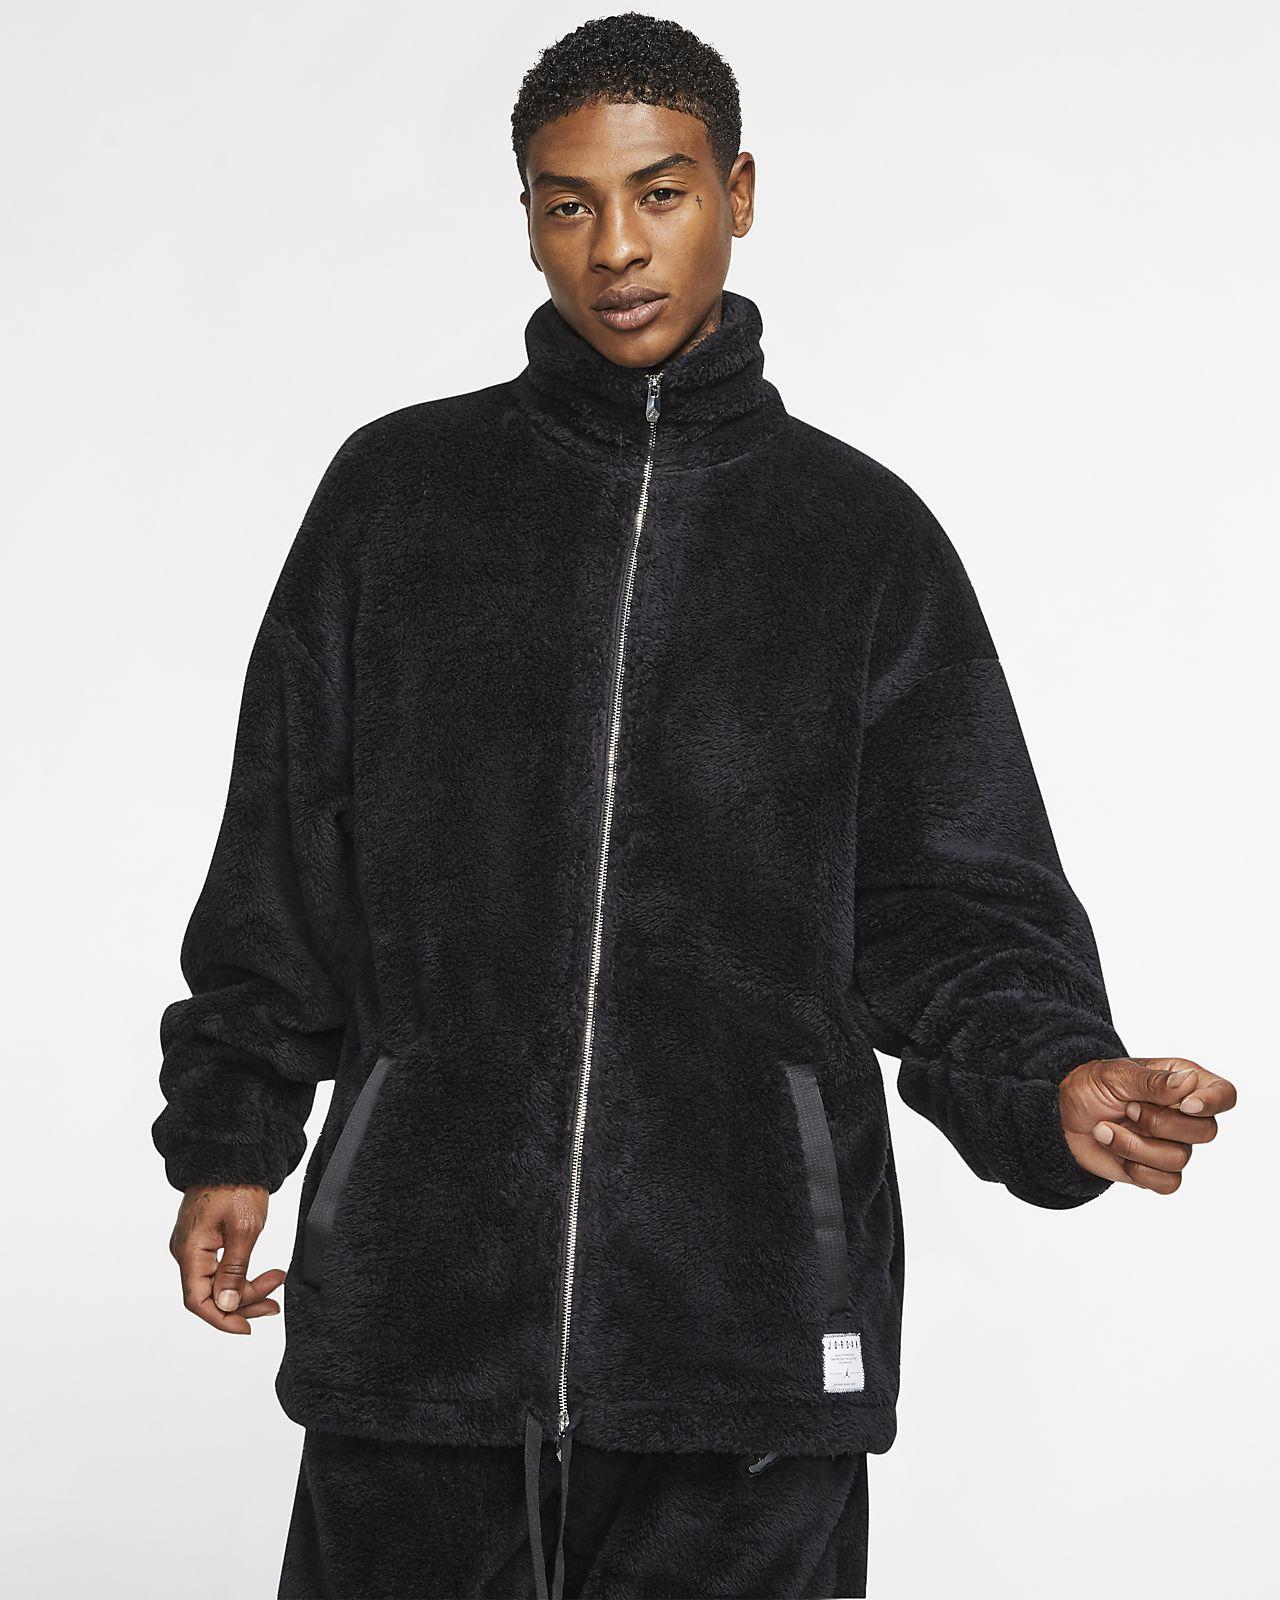 Jordan Black Cat Sherpa Coaches' Jacket